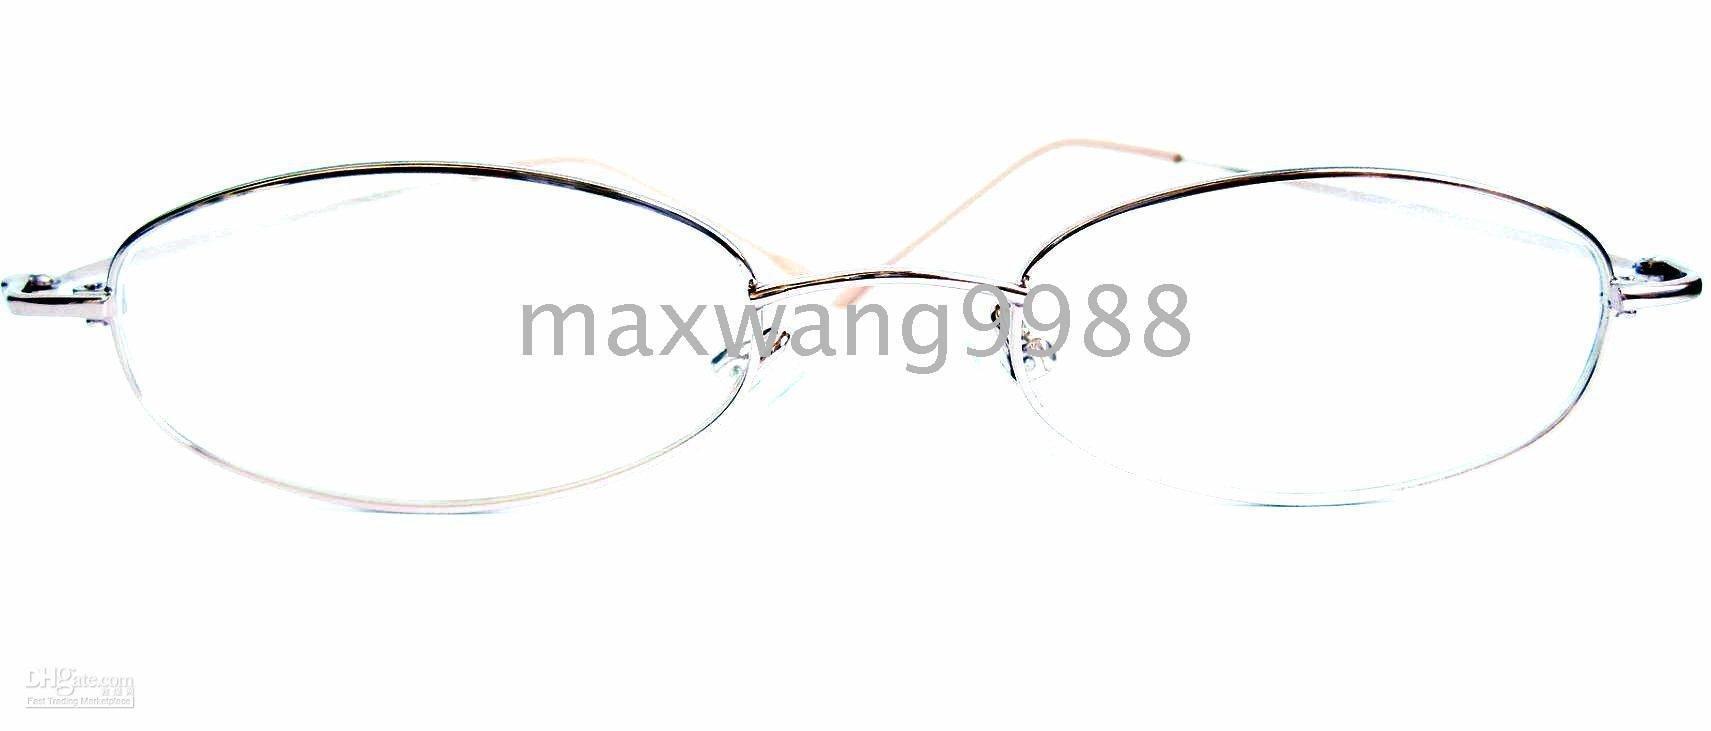 Prescription Rx Optical Eyeglasses Free Delivery Best Sellers Fashion Lens Frames Women'S Me ...